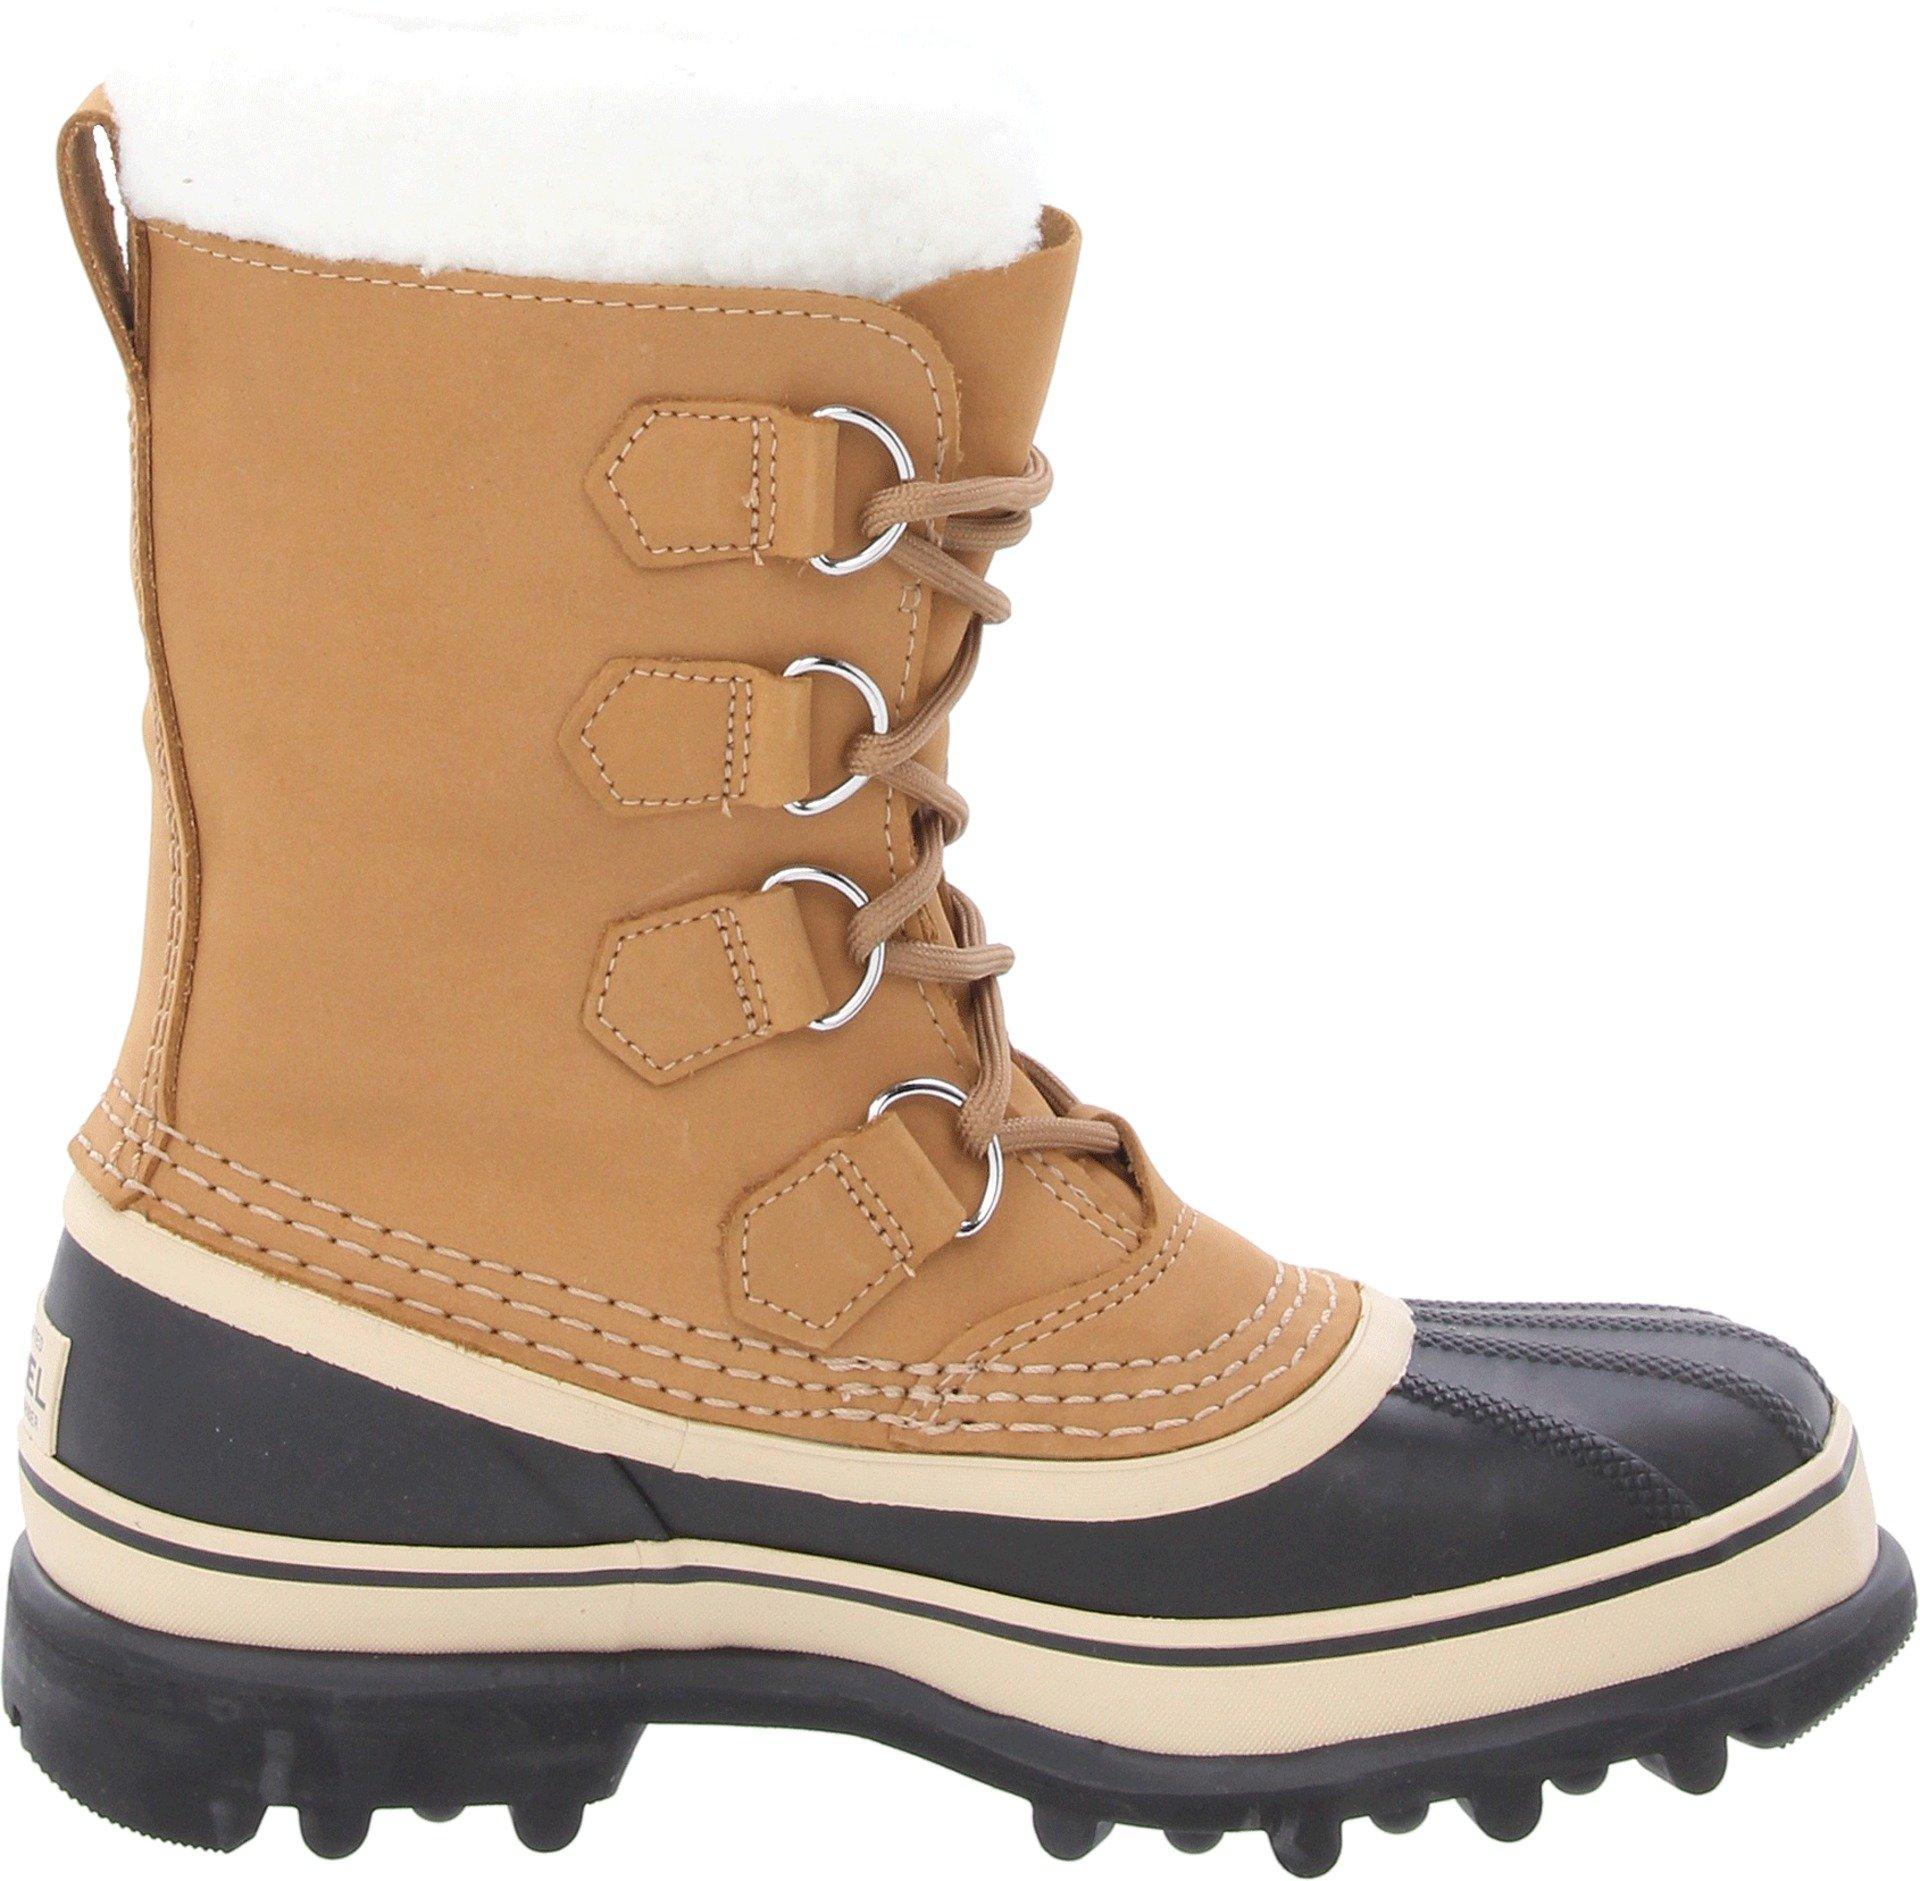 SOREL Women's Caribou NL1005 Boot,Buff,10 M by SOREL (Image #7)